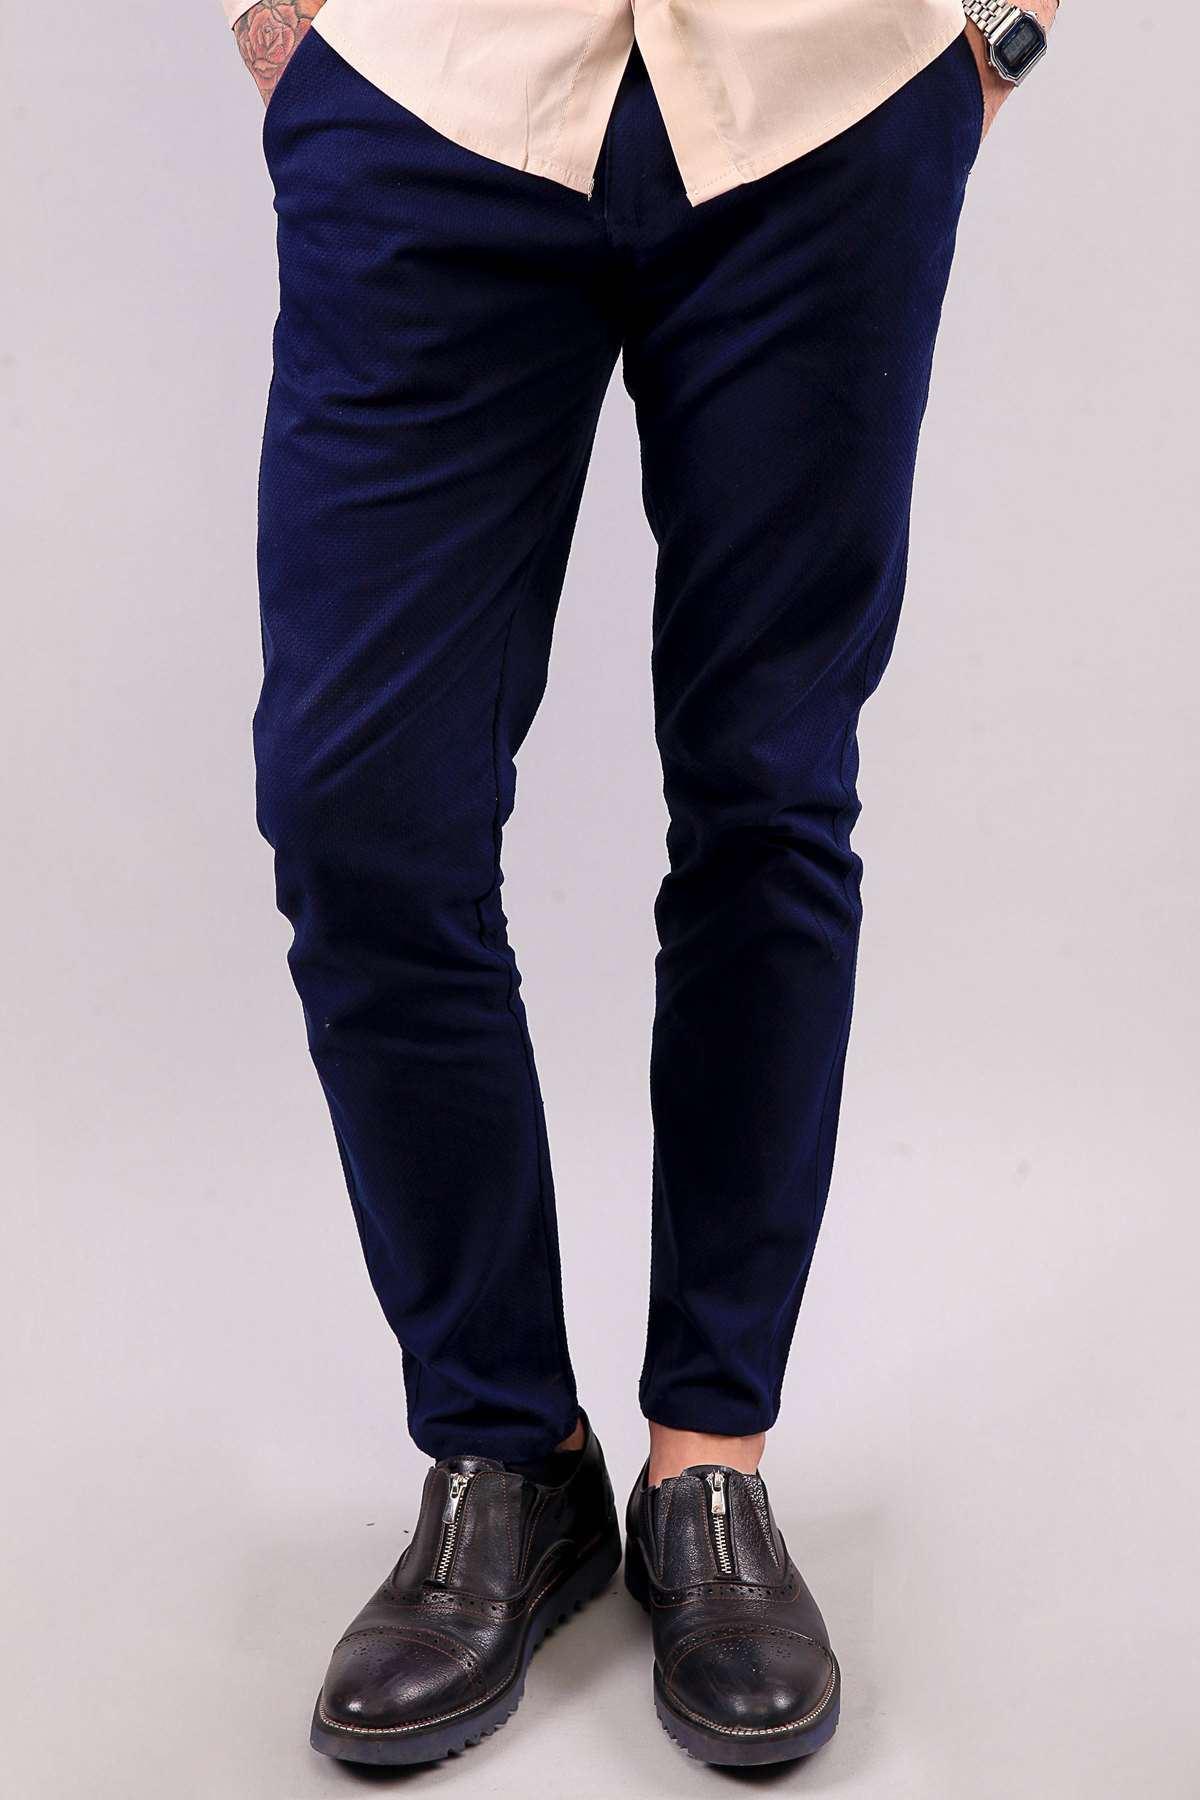 Petek Desenli Yan Cepli Slim Fit Pantolon Laci